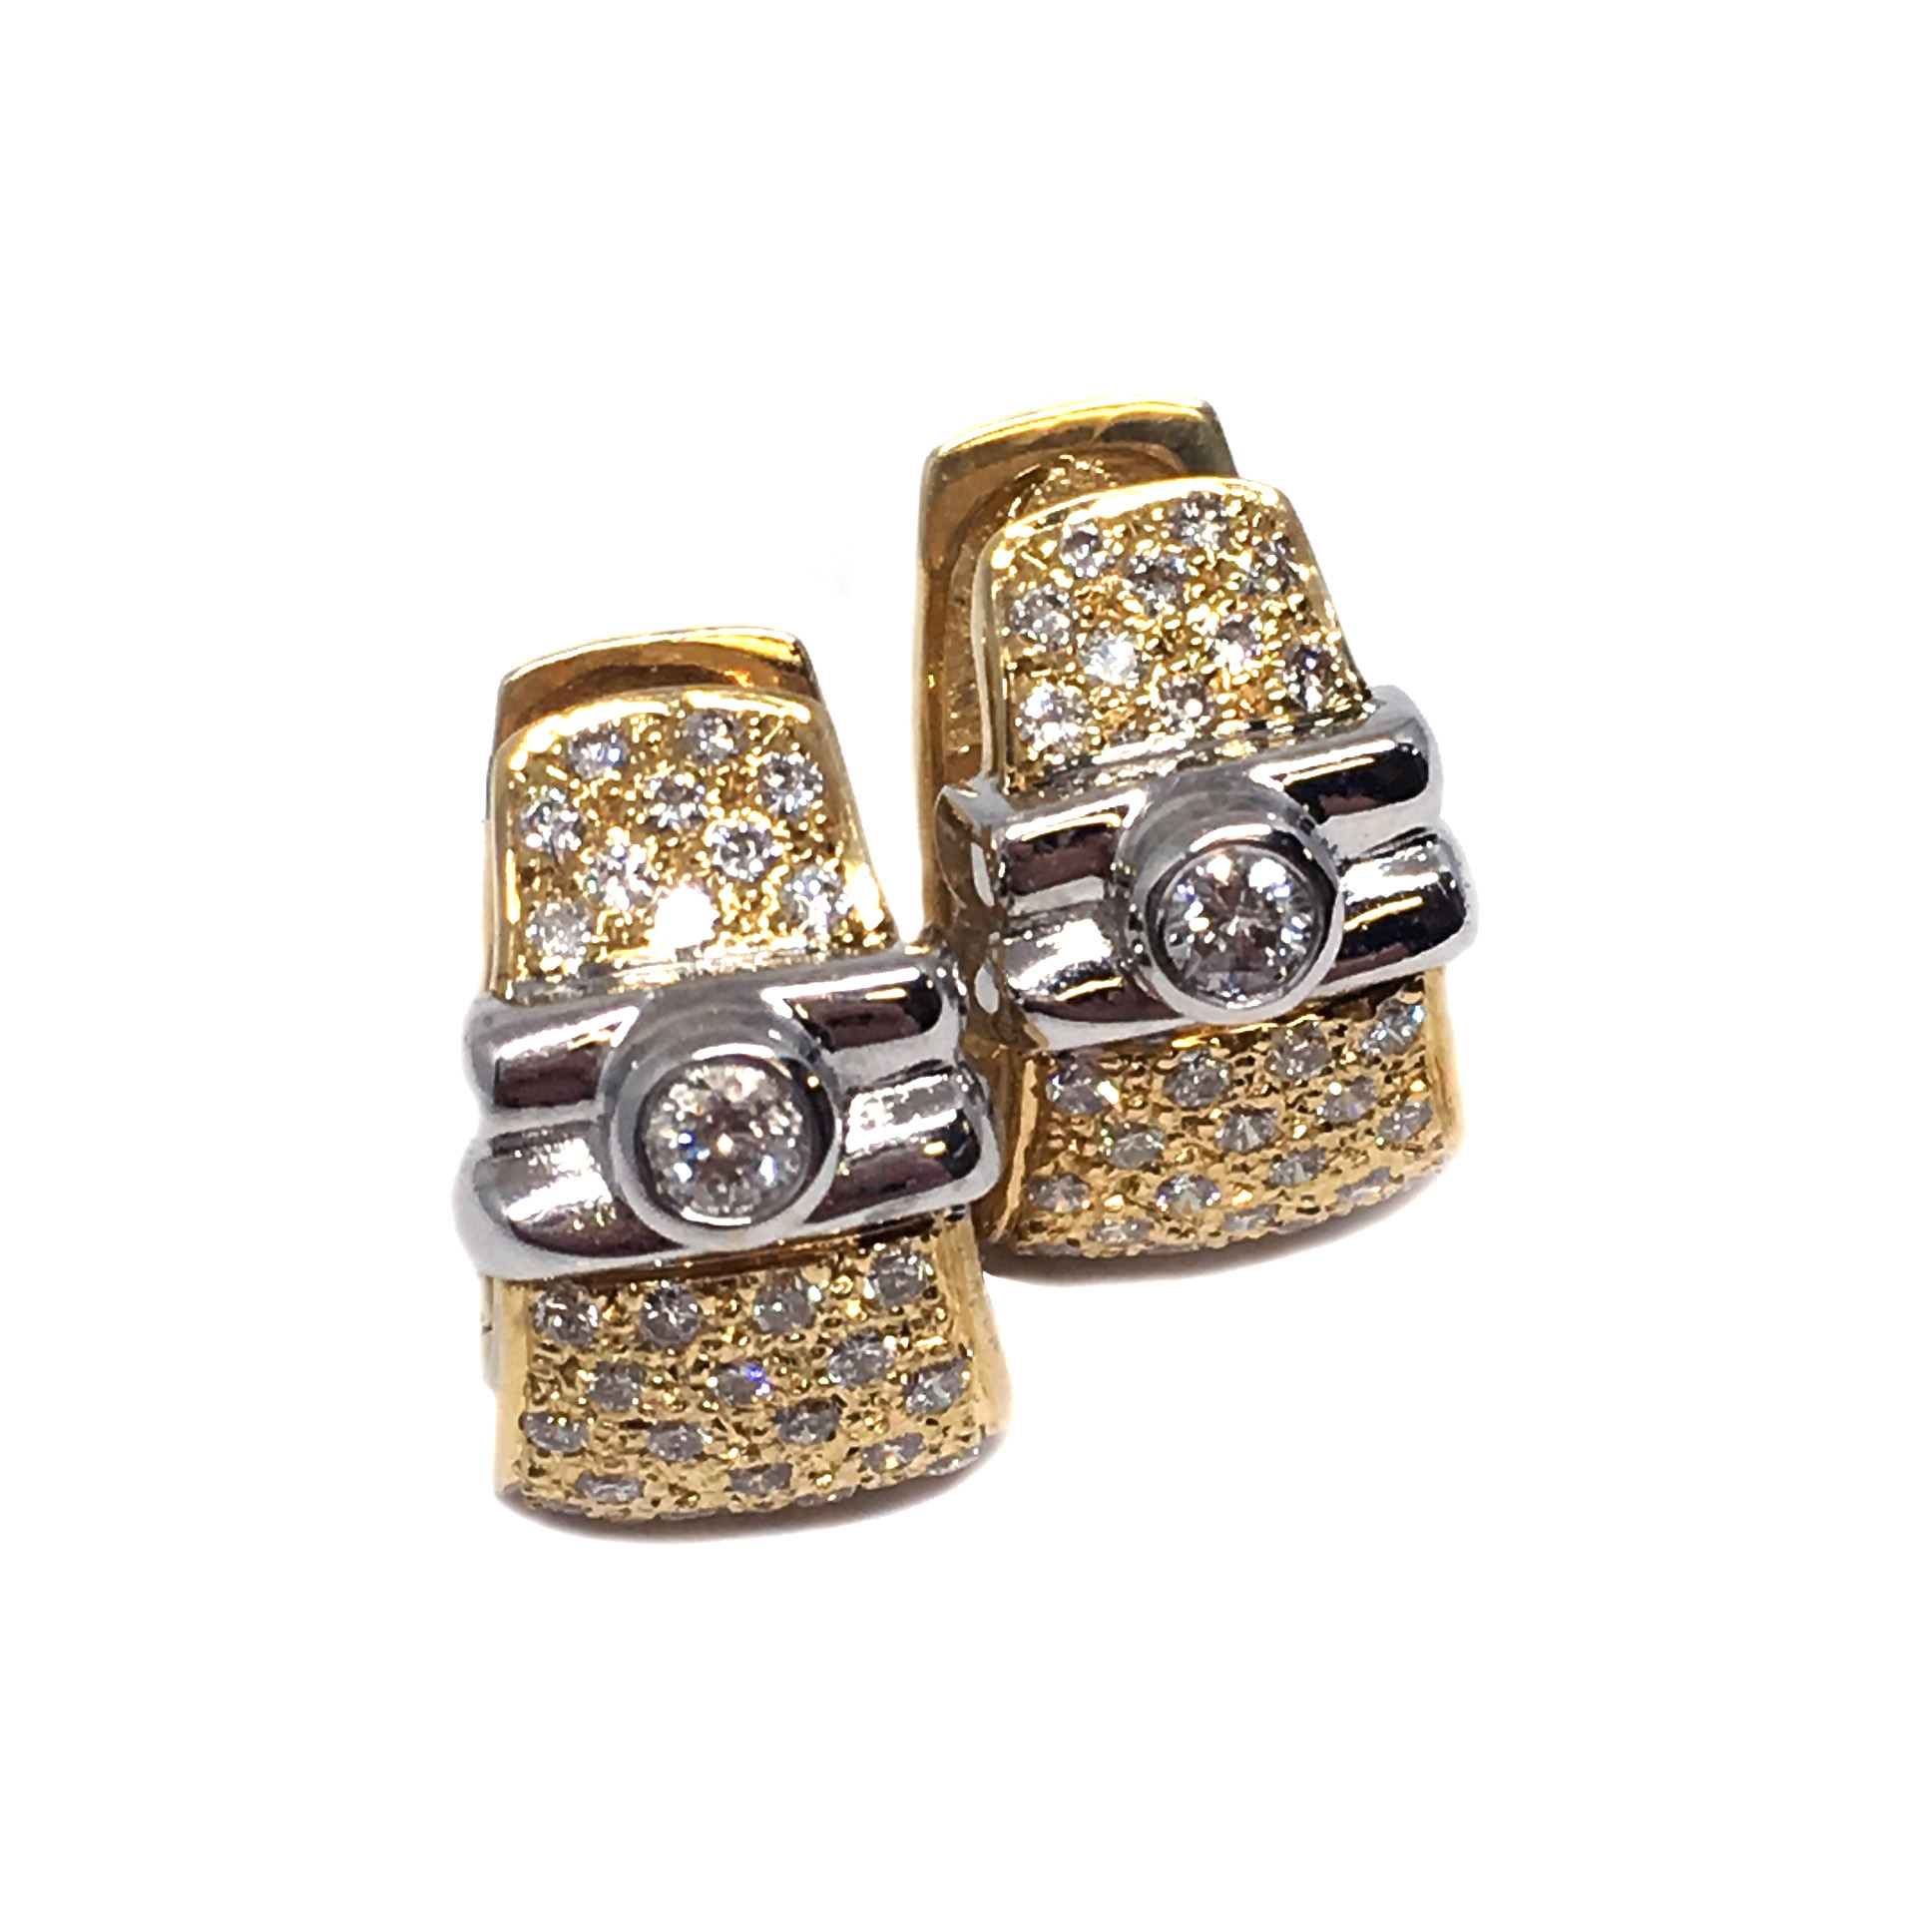 Two-Tone Yellow & White Gold Diamond Earrings